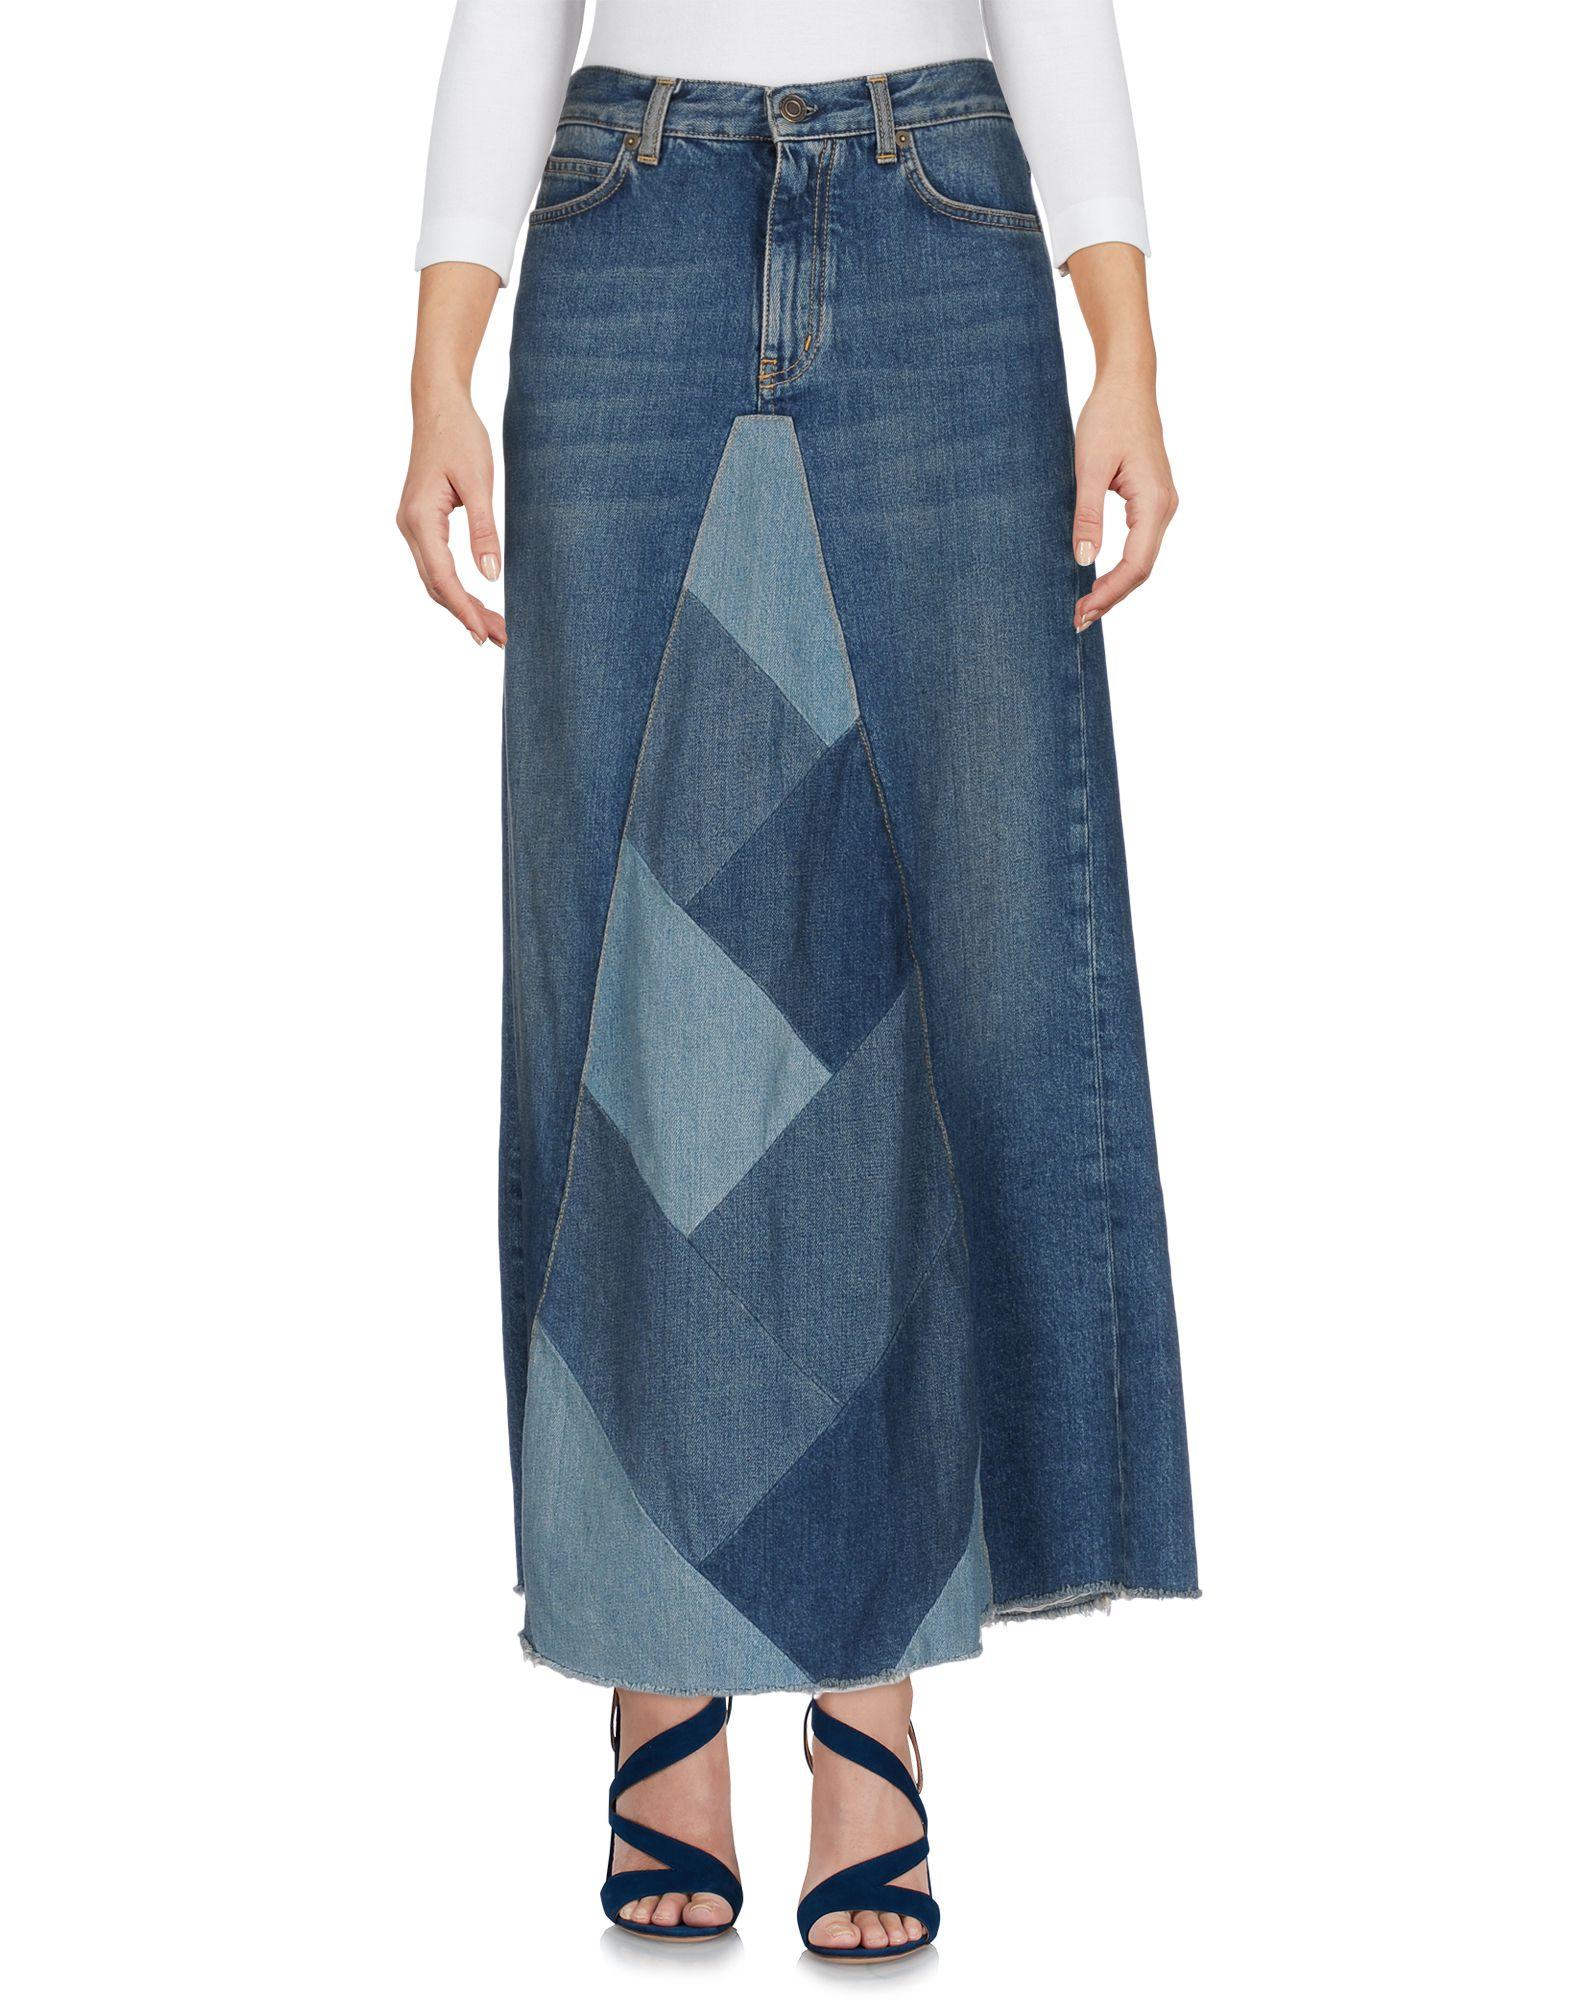 SAINT LAURENT Damen Jeansrock Farbe Blau Größe 4